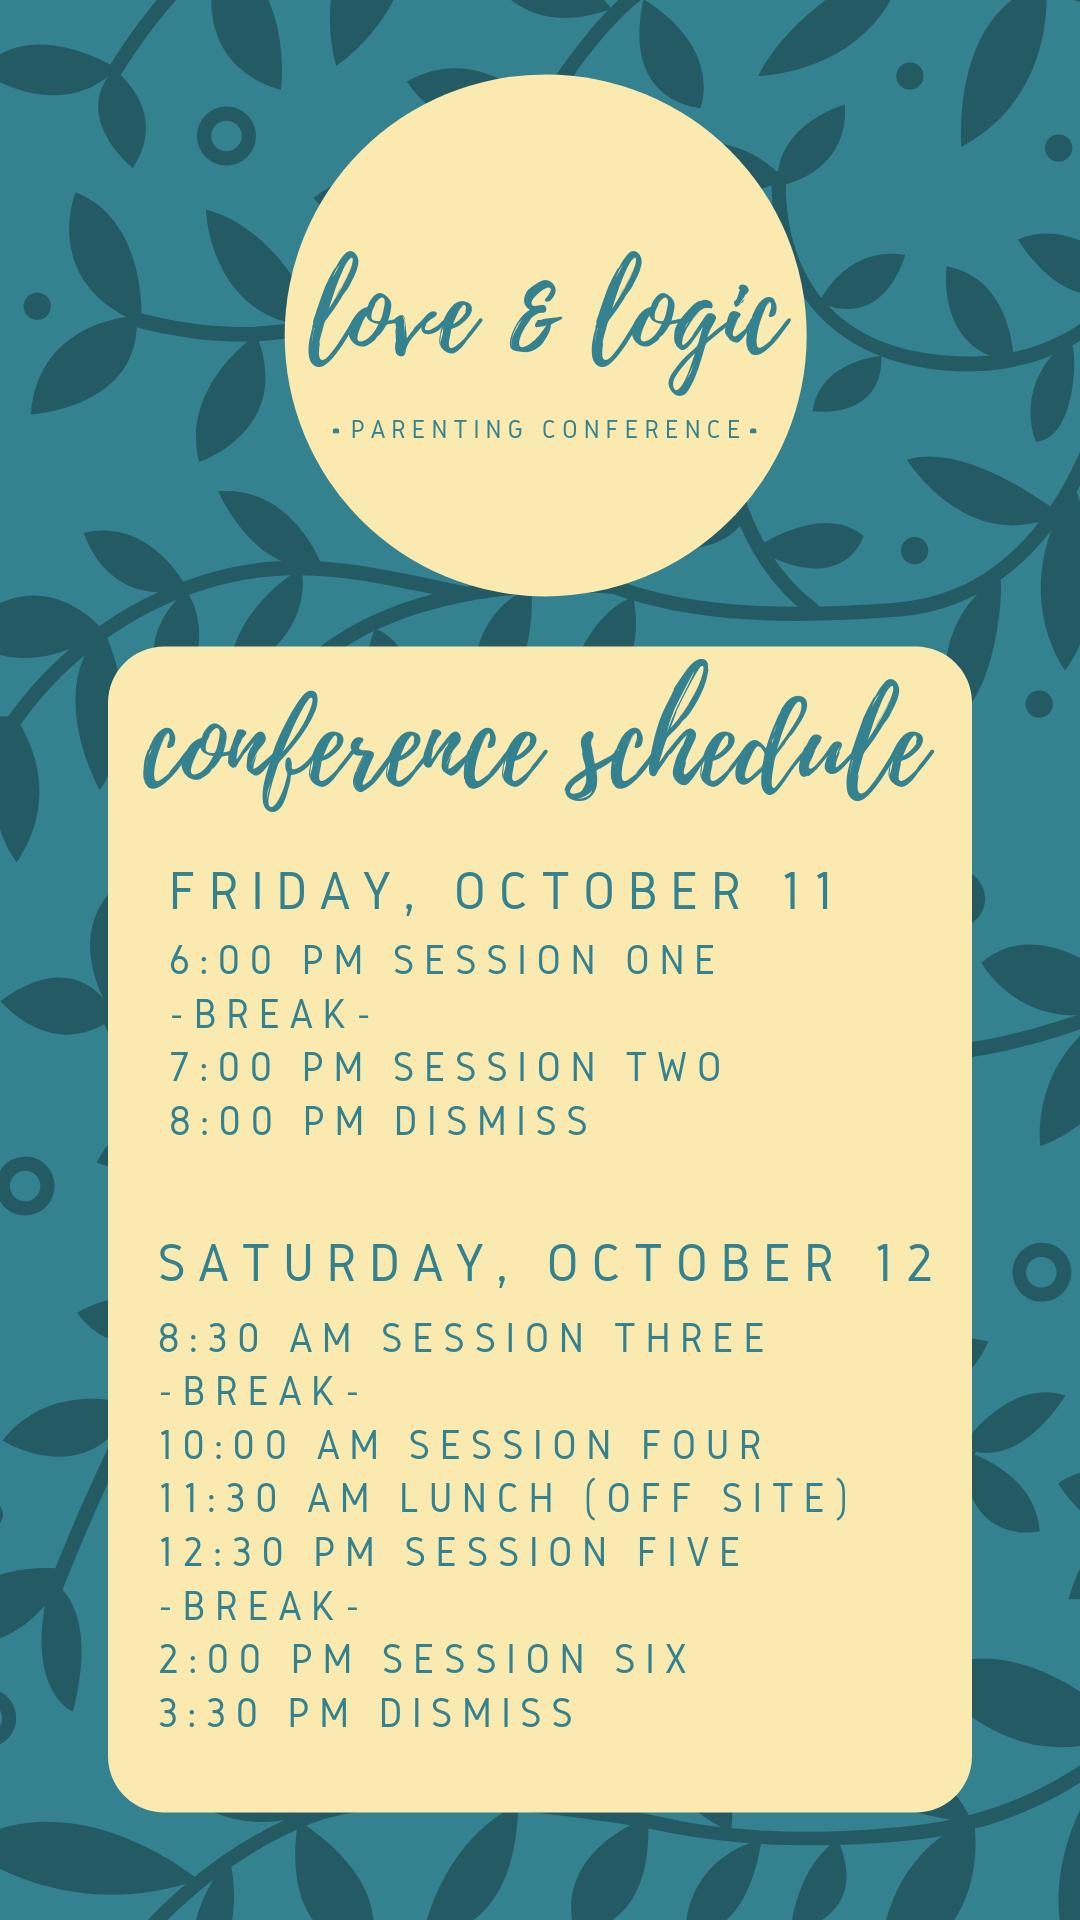 l&l conference schedule.png